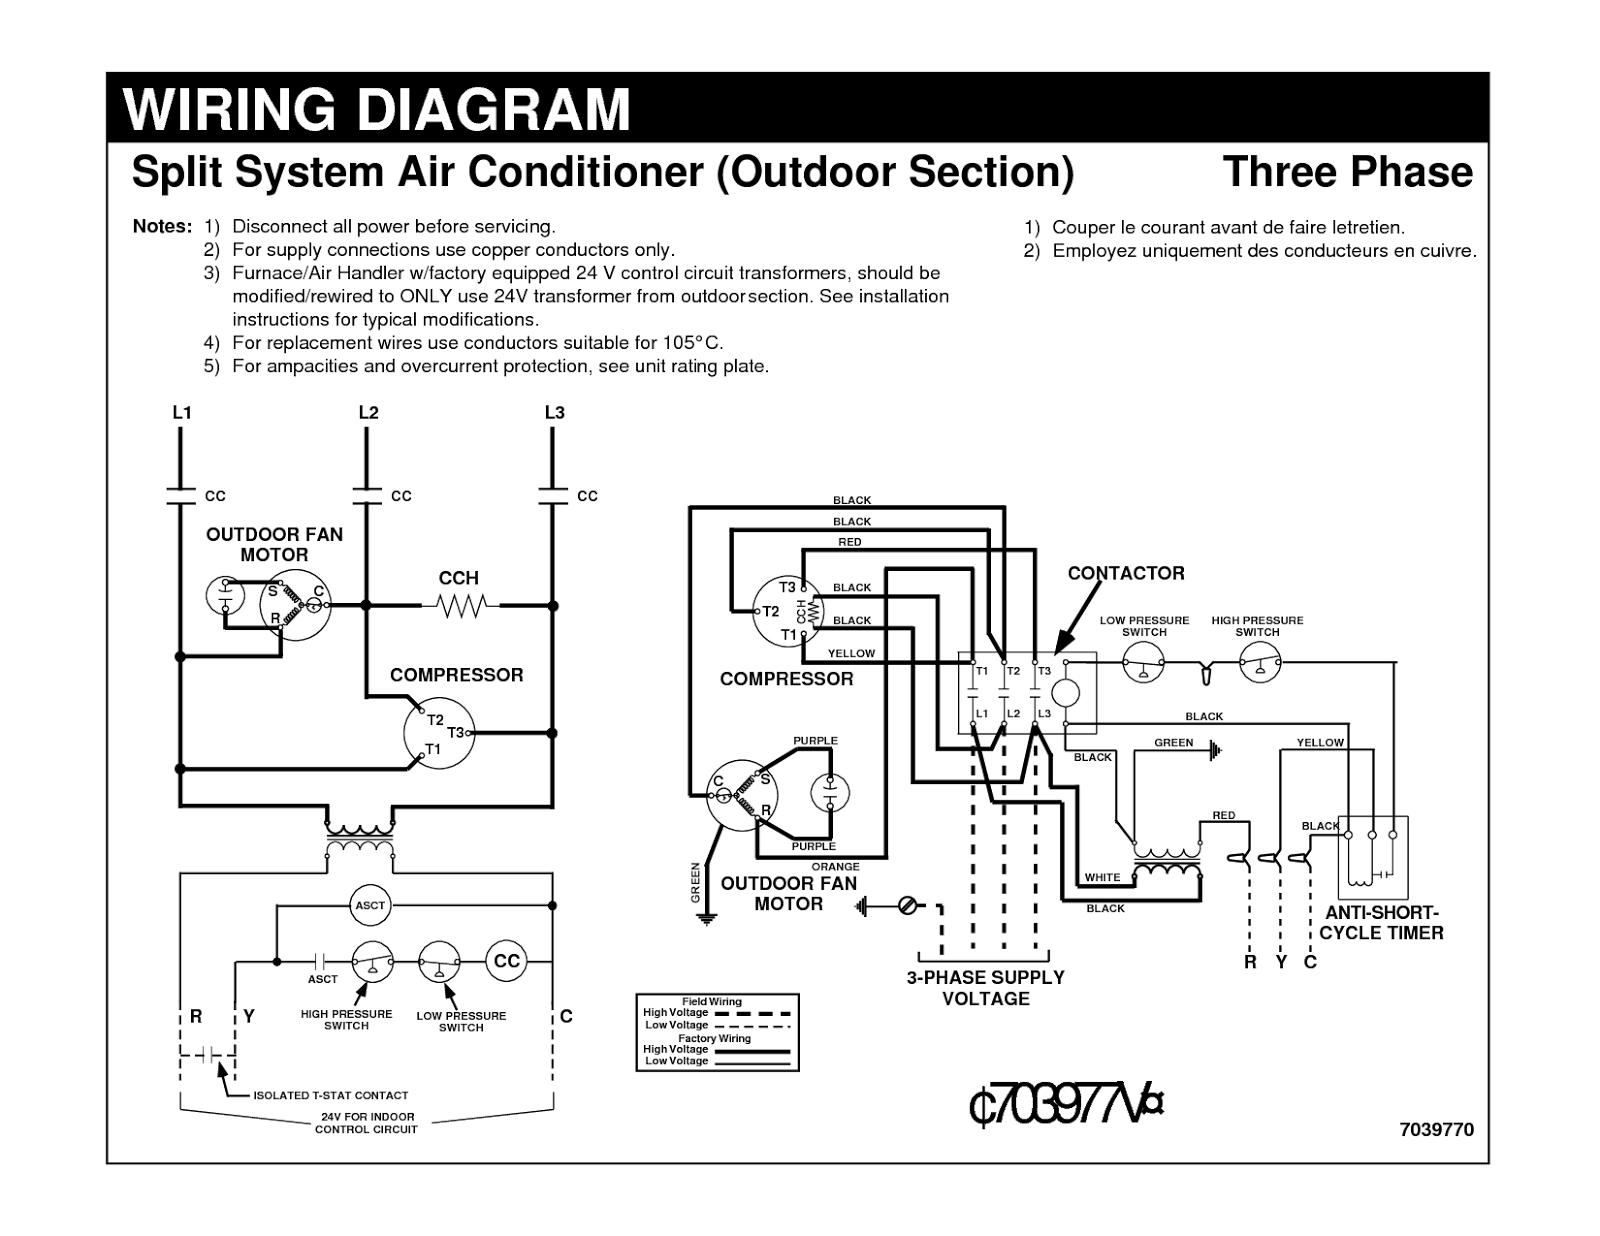 Ac Installation Diagram - Data Wiring Diagram Today - Auto Ac Compressor Wiring Diagram